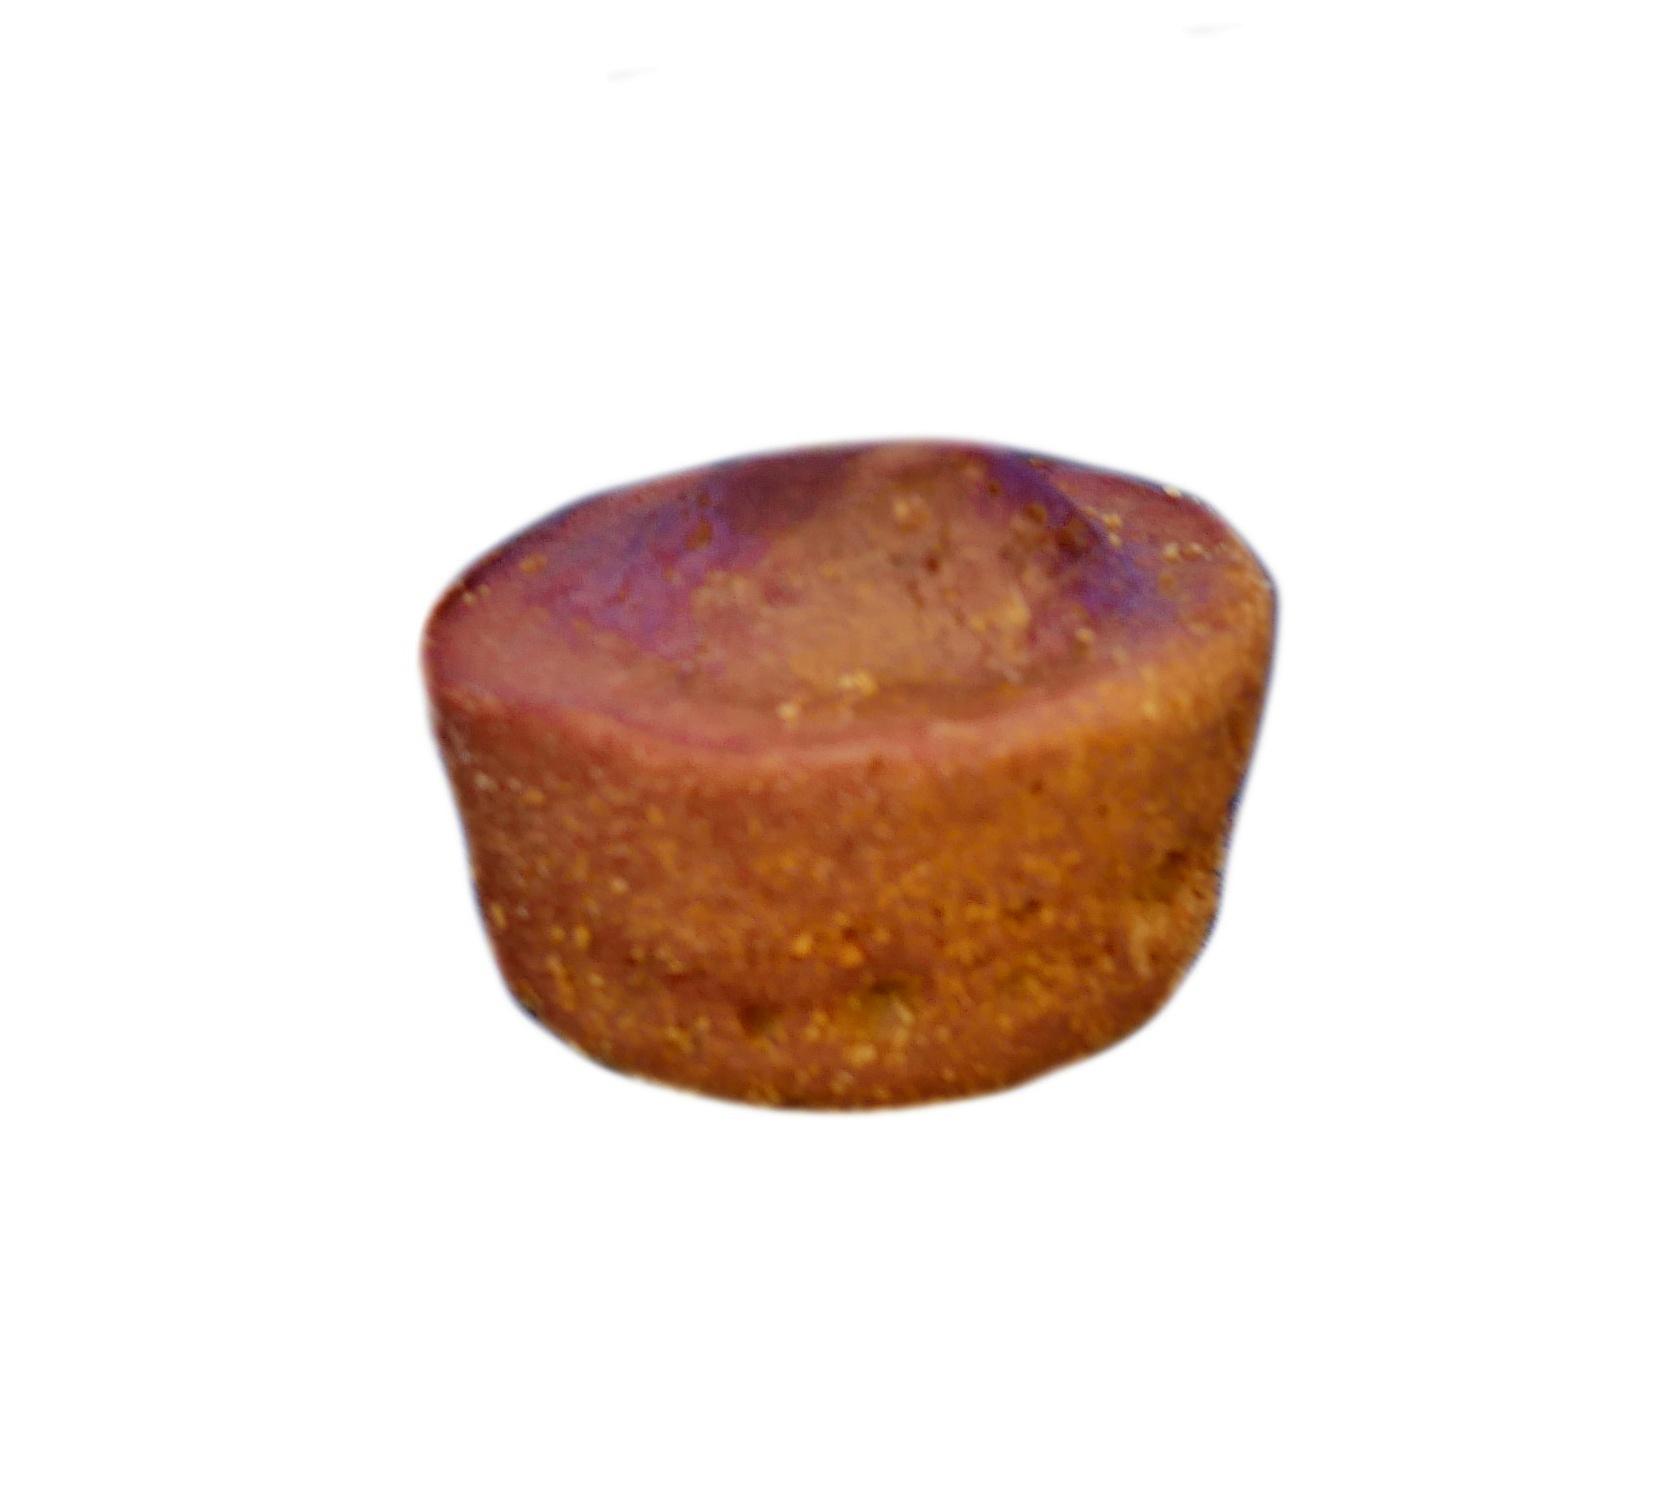 Bonbon Sirop ( 3 packs of 2)